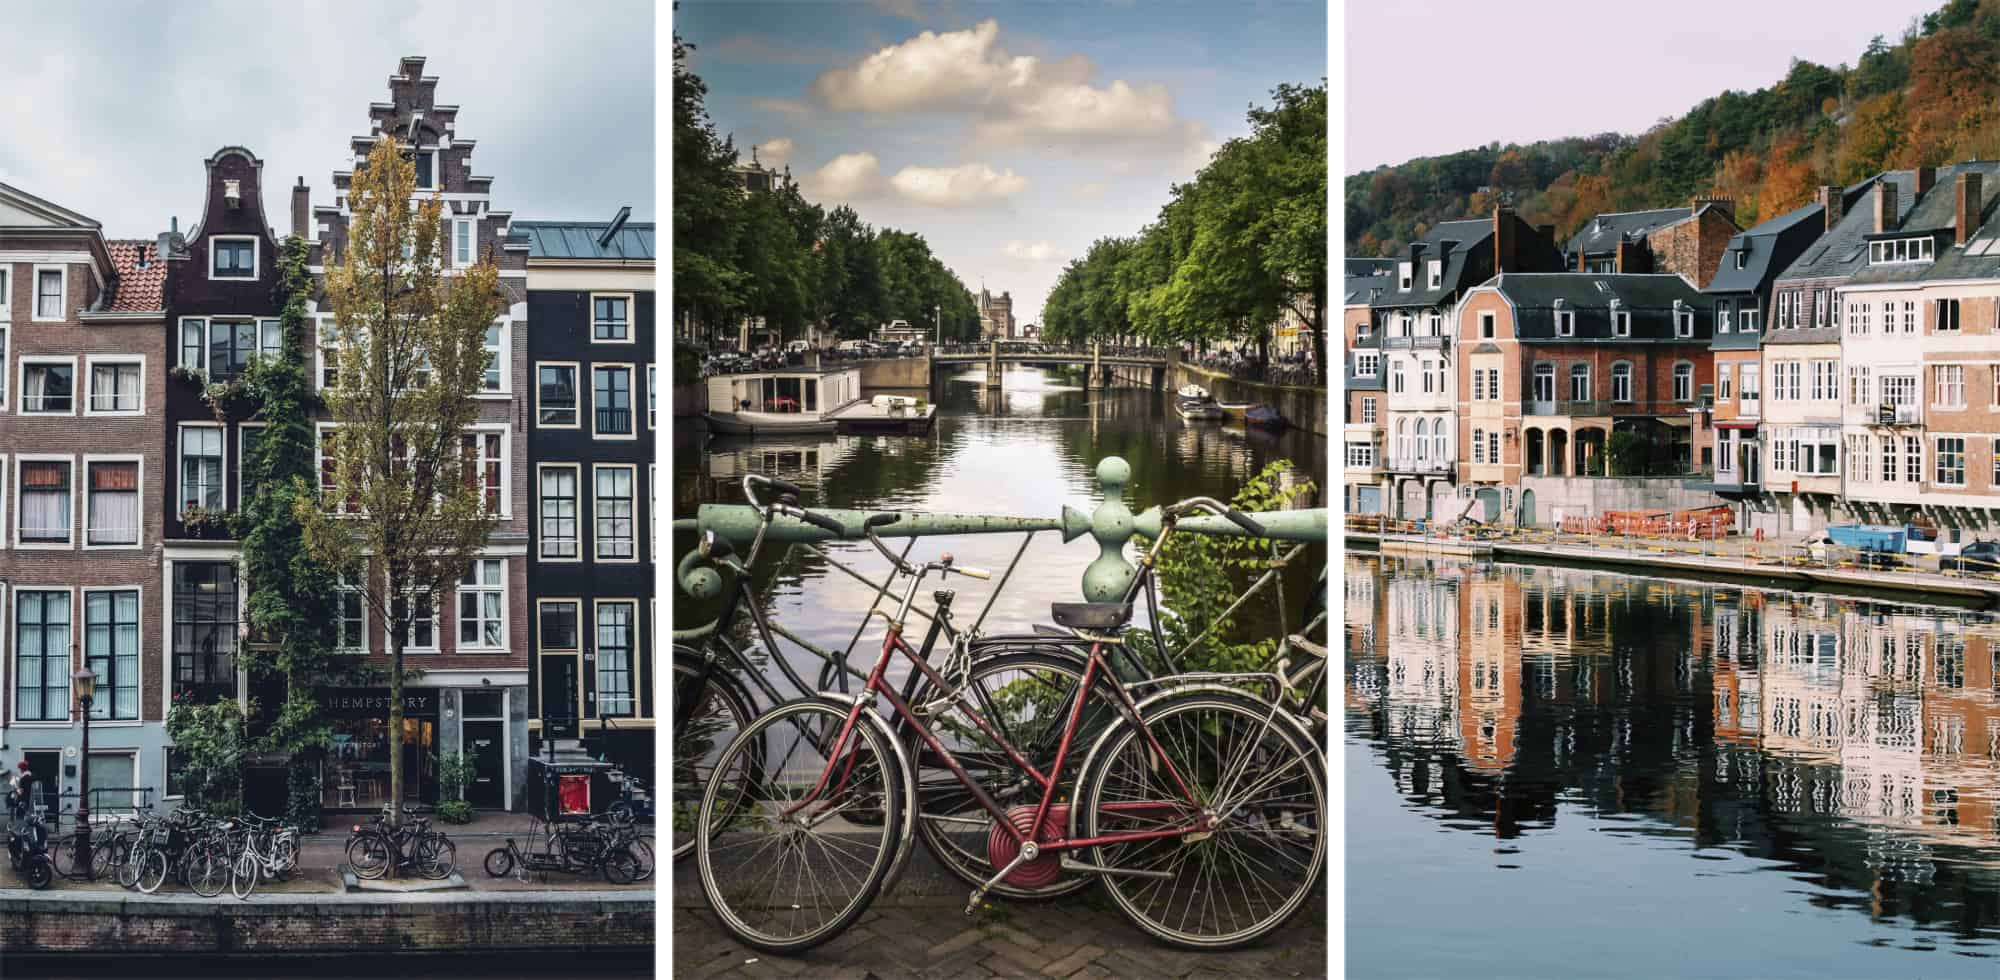 11+ Honest Tips for Studying Abroad in Europe via @girlsgonelondon